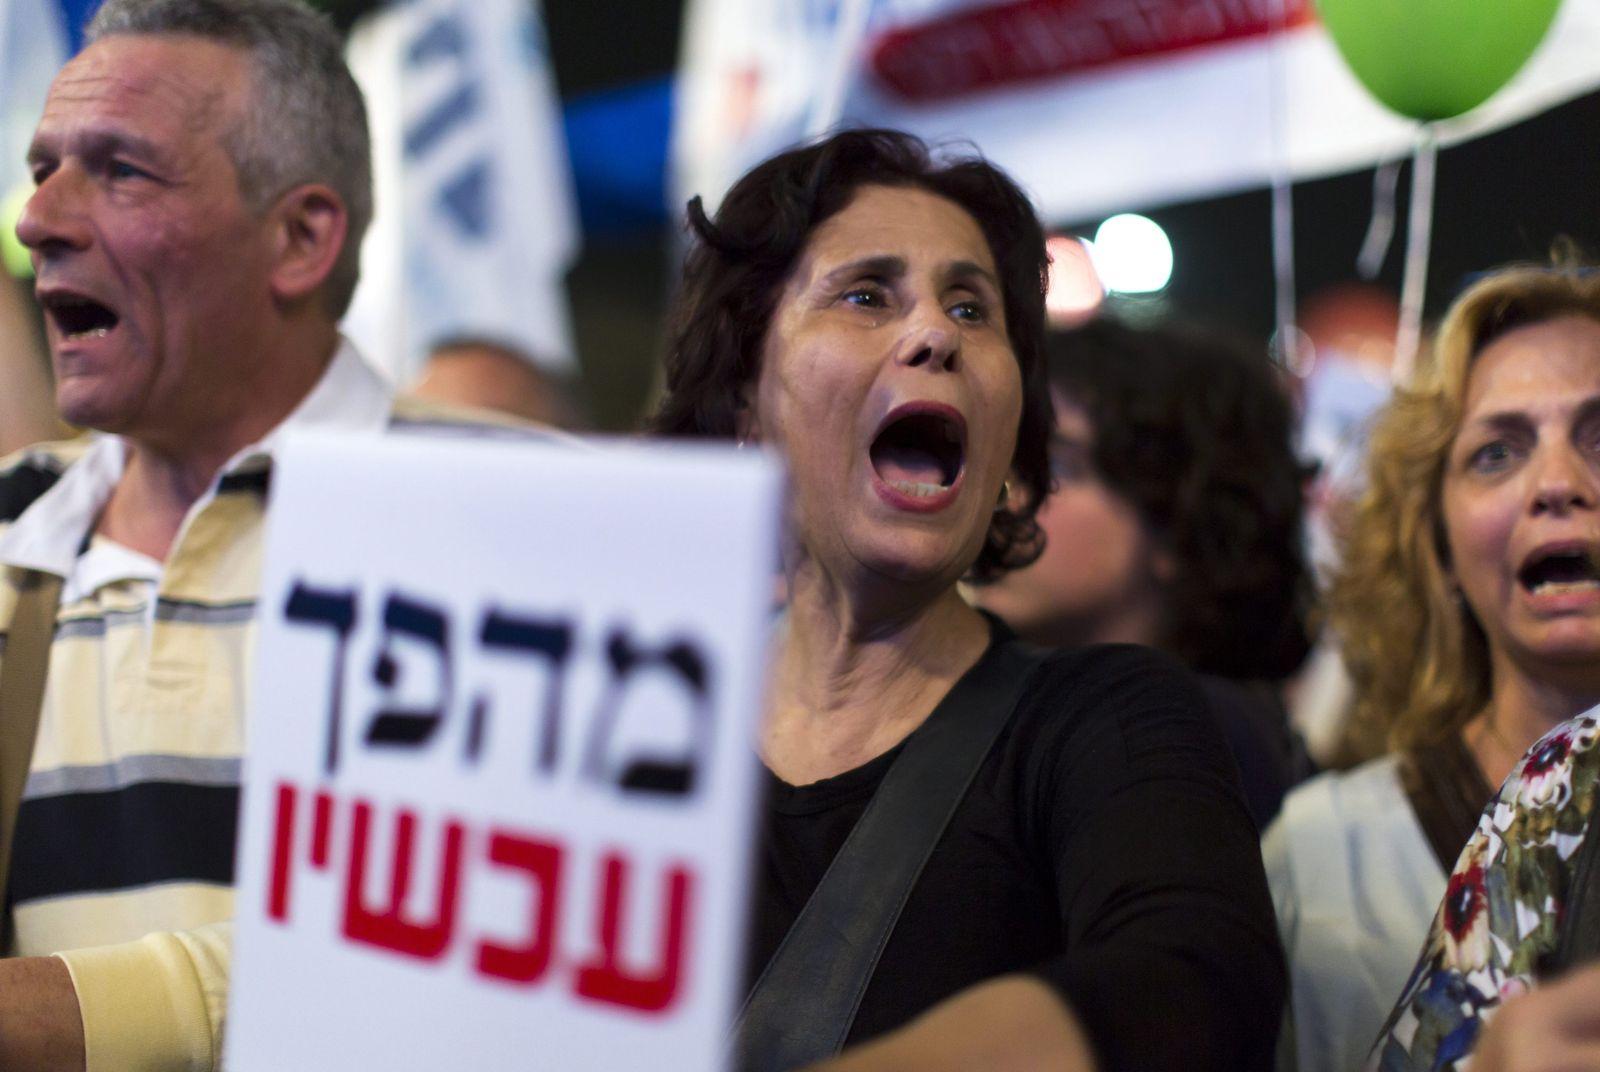 Israel Needs Change rally in rabin Square in Tel Aviv